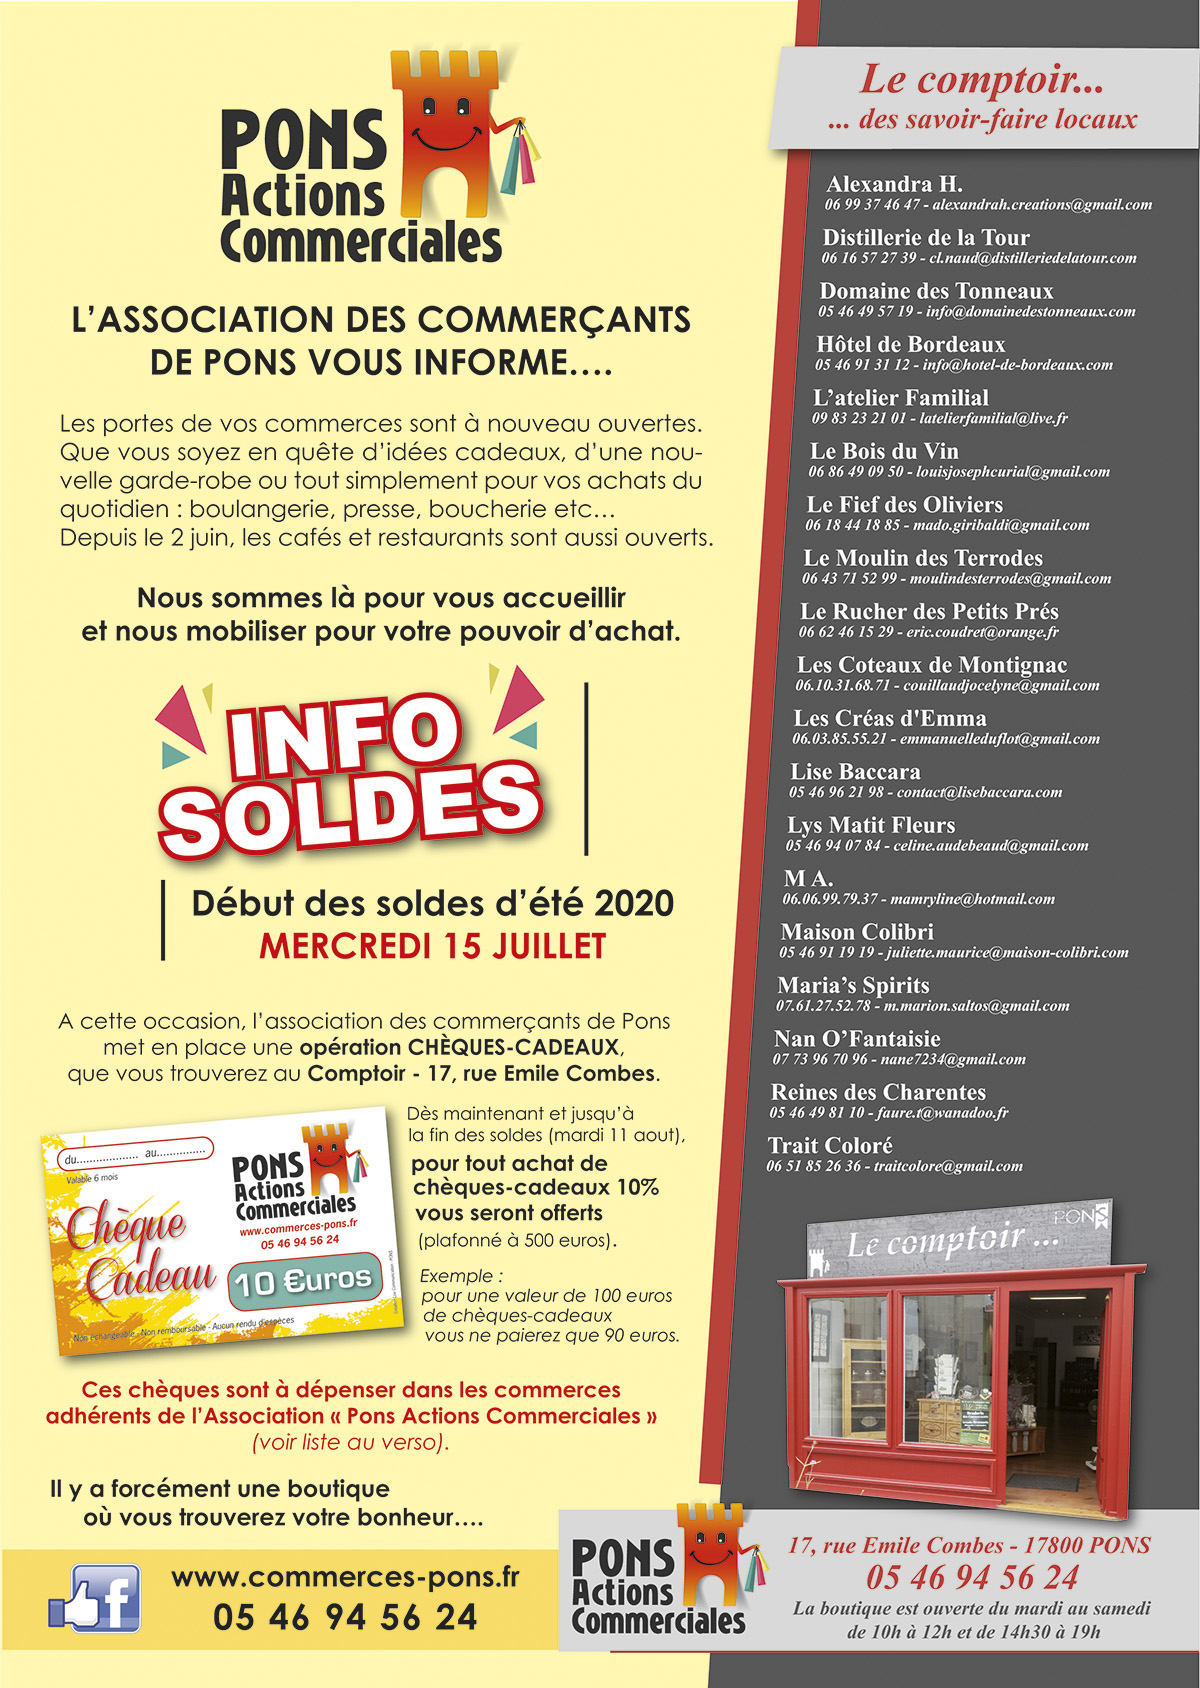 Pons Actions Commerciales - Flyer Juillet 2020 Soldes